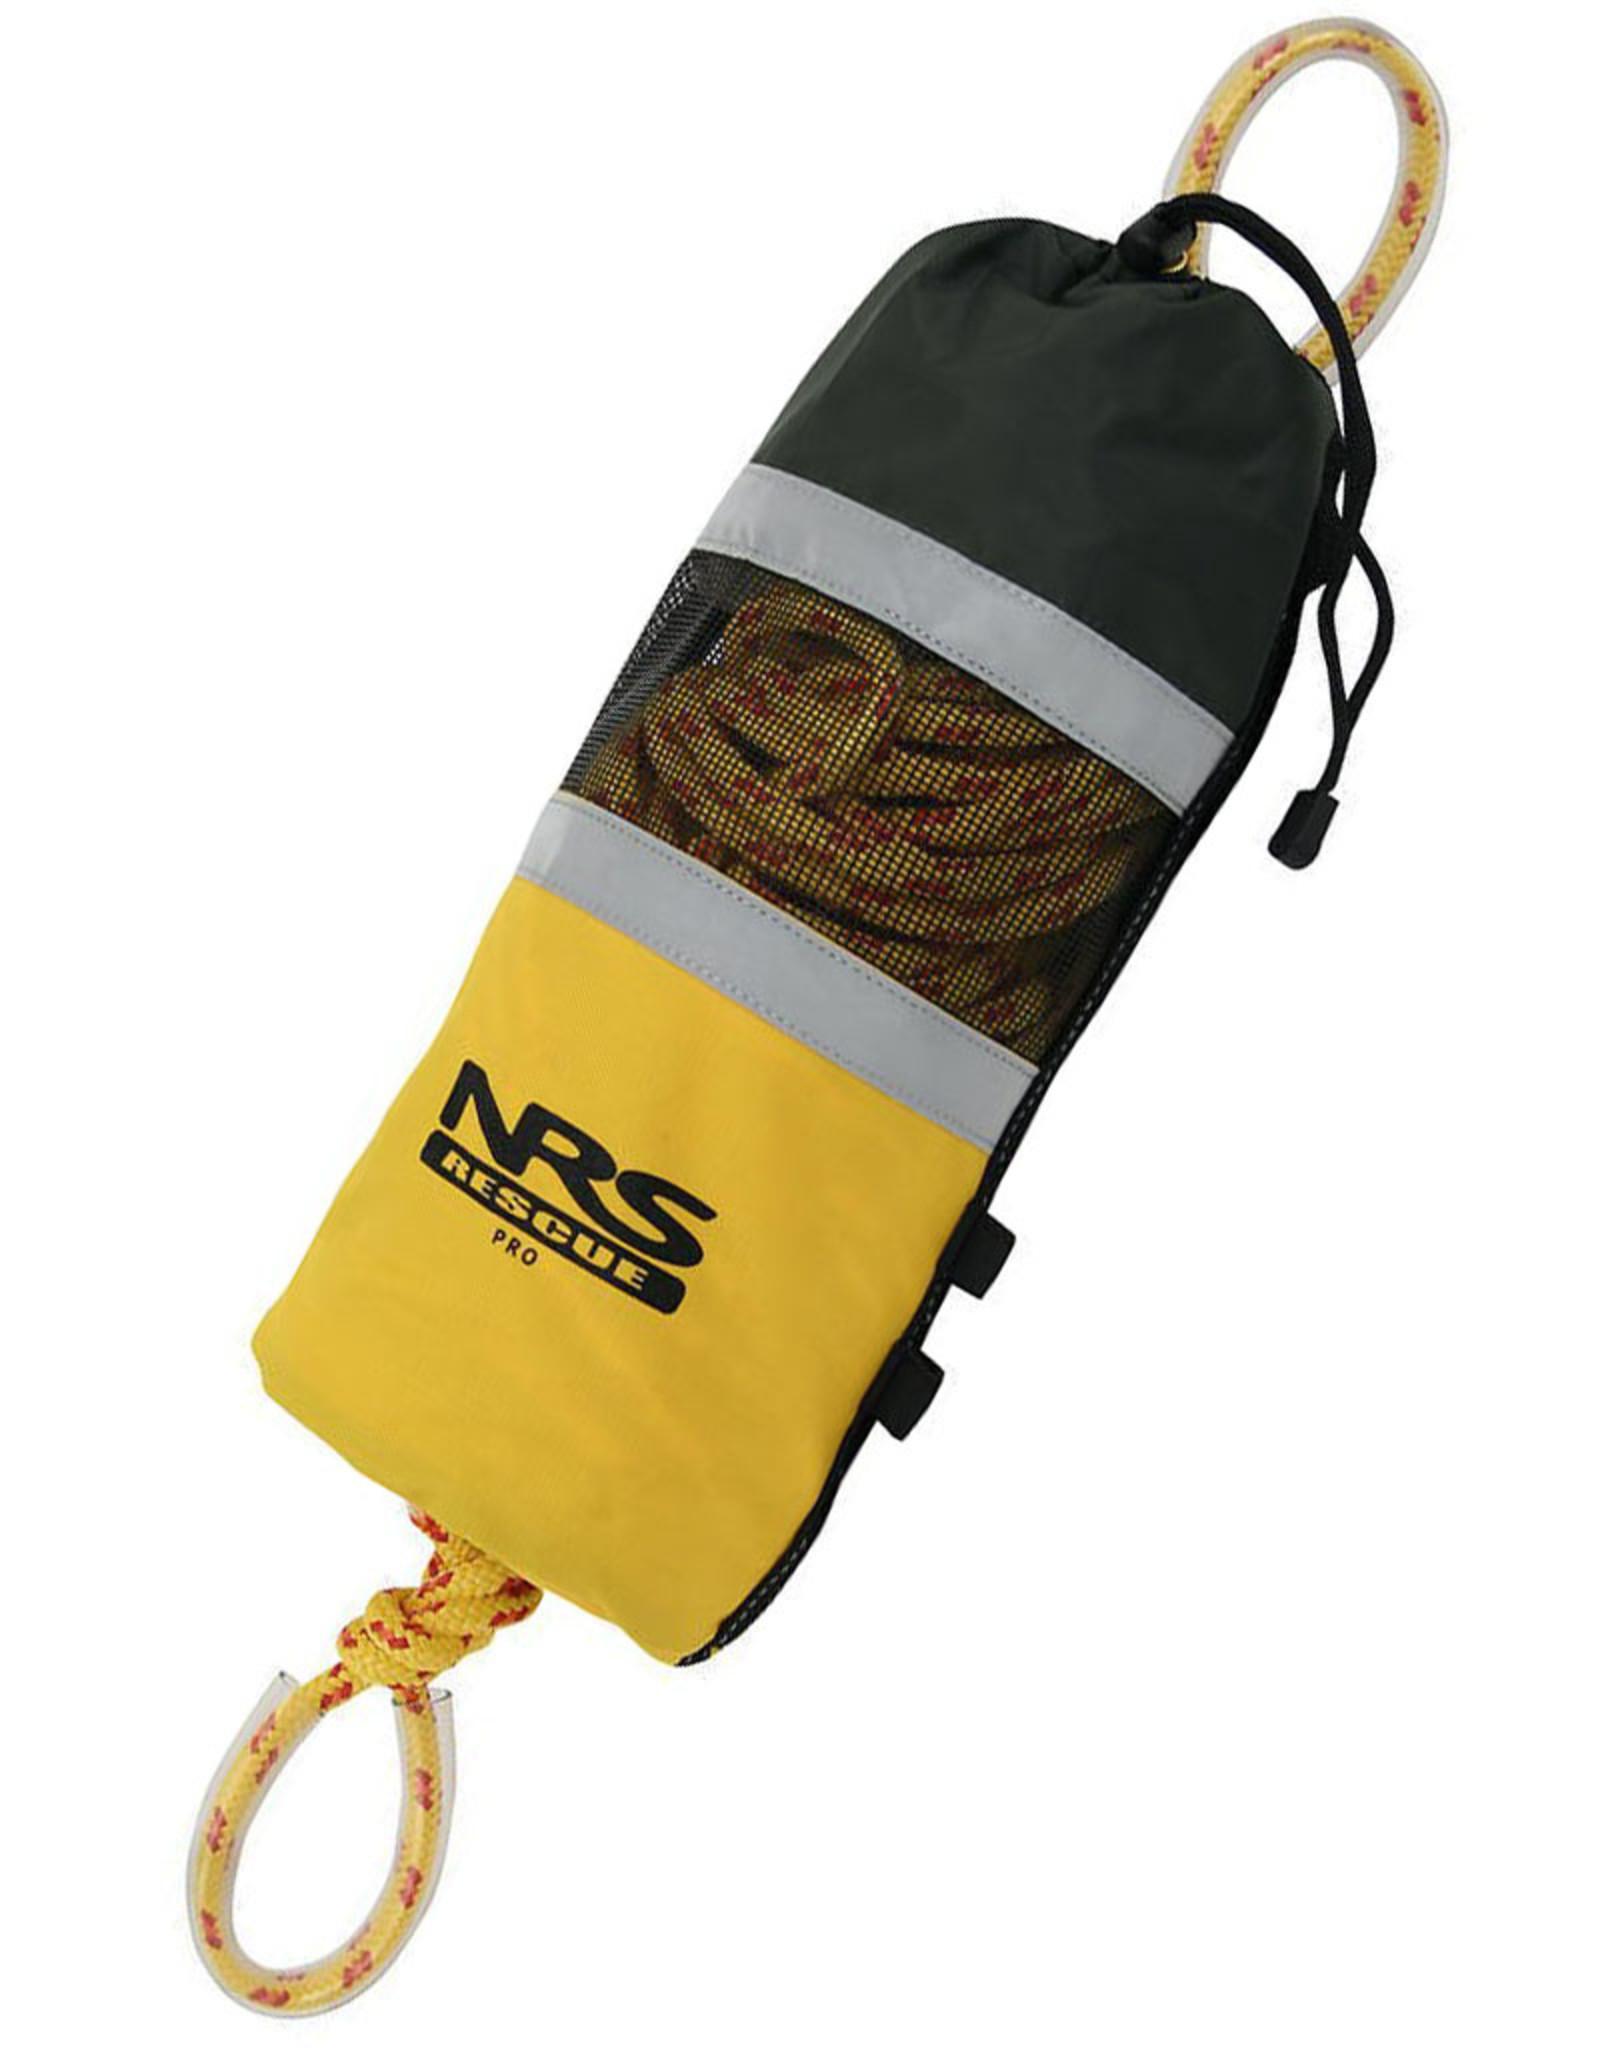 NRS NRS Pro Rescue Bag